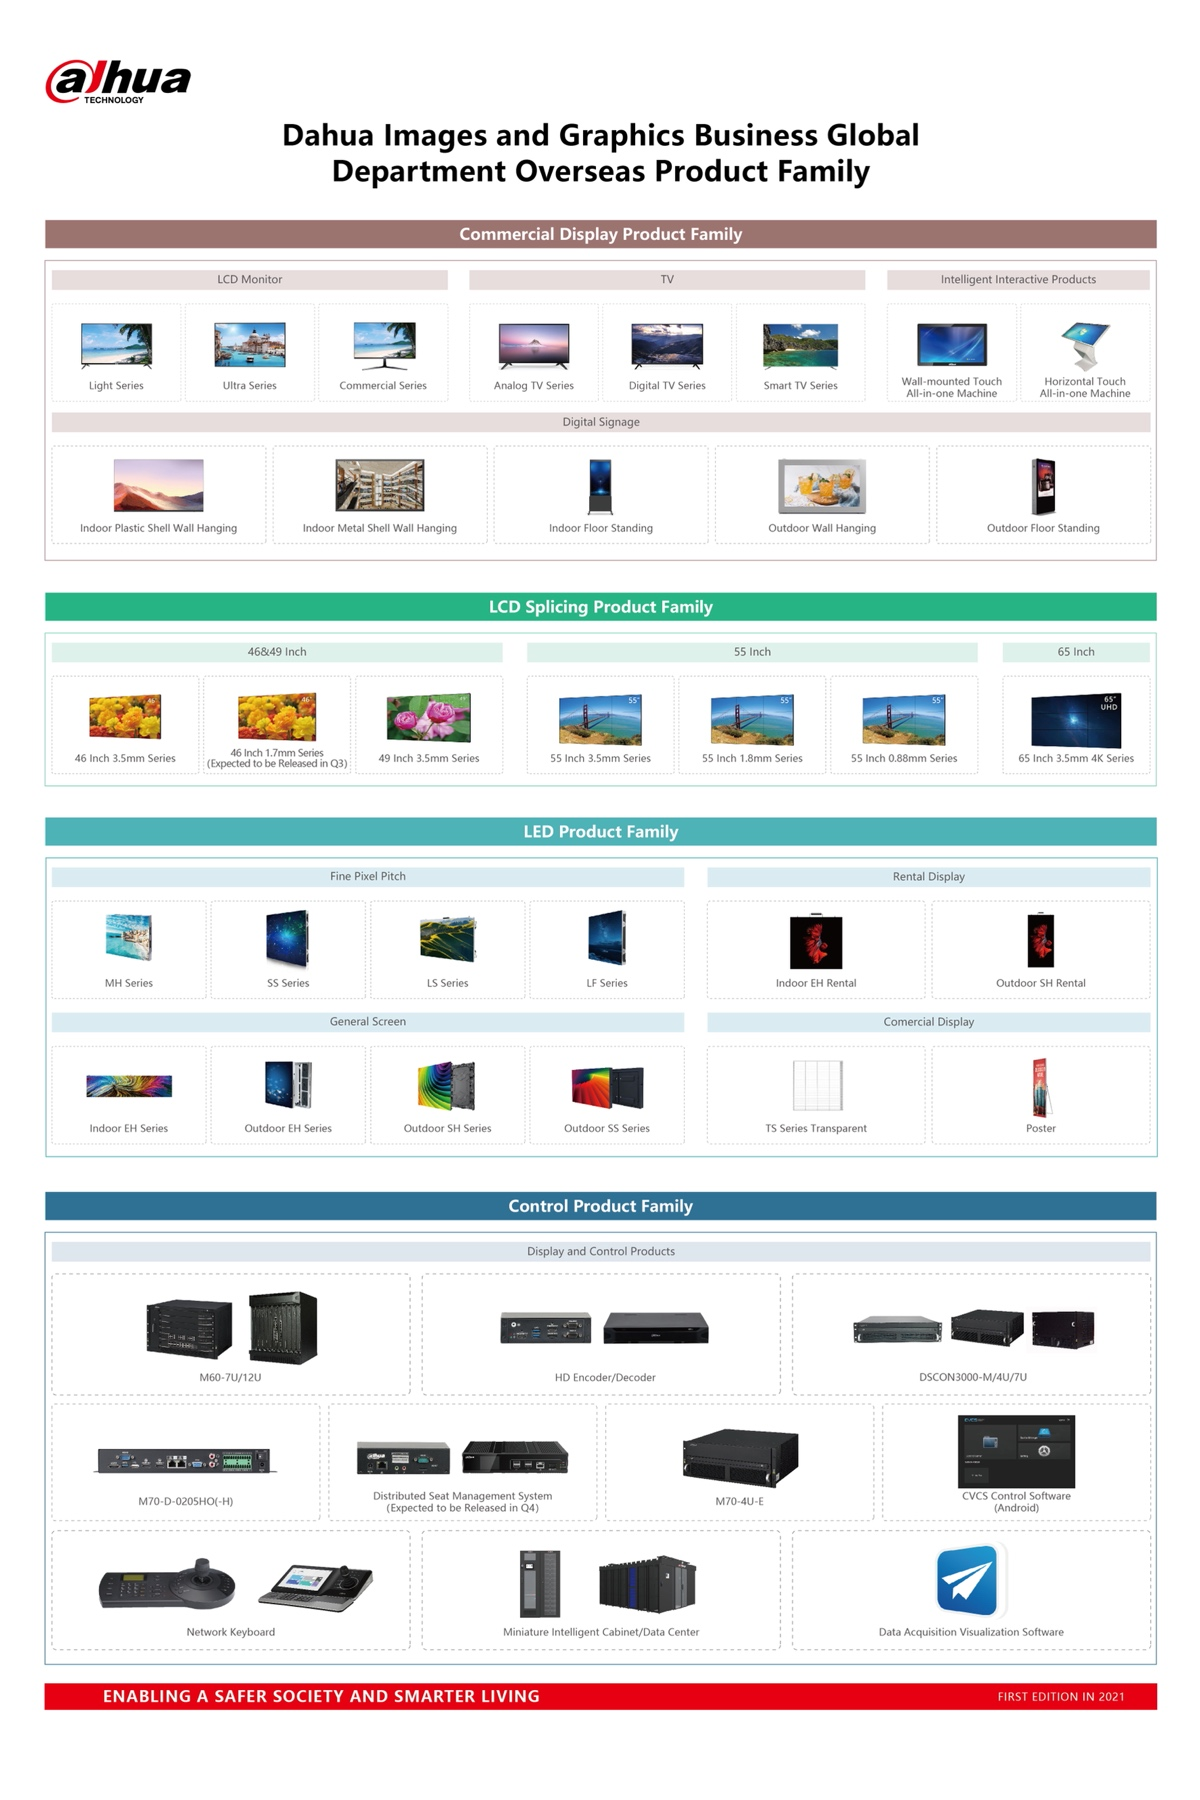 dahua technology products